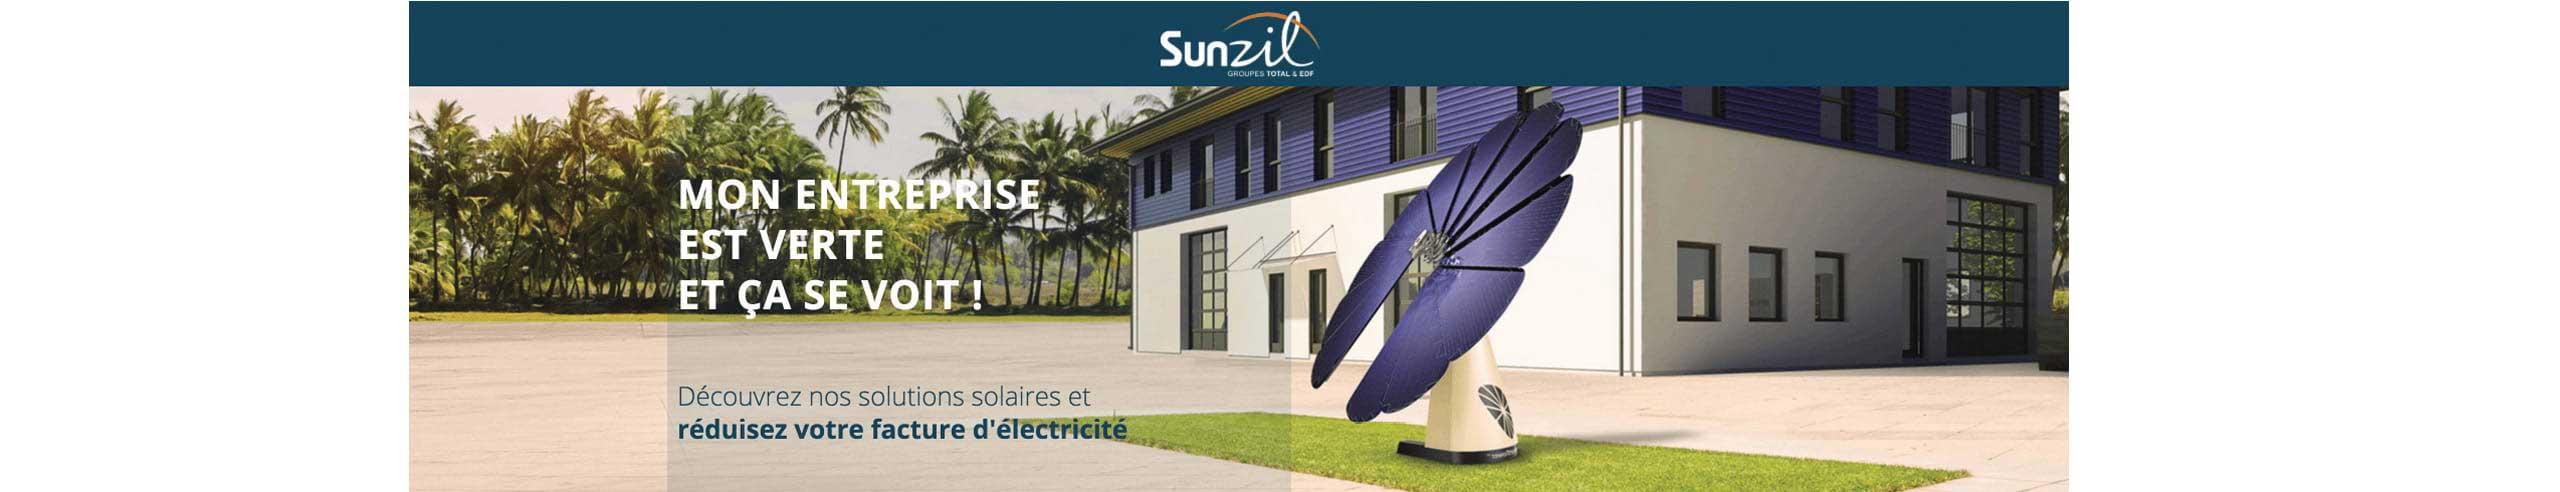 sunzil-banniere-3